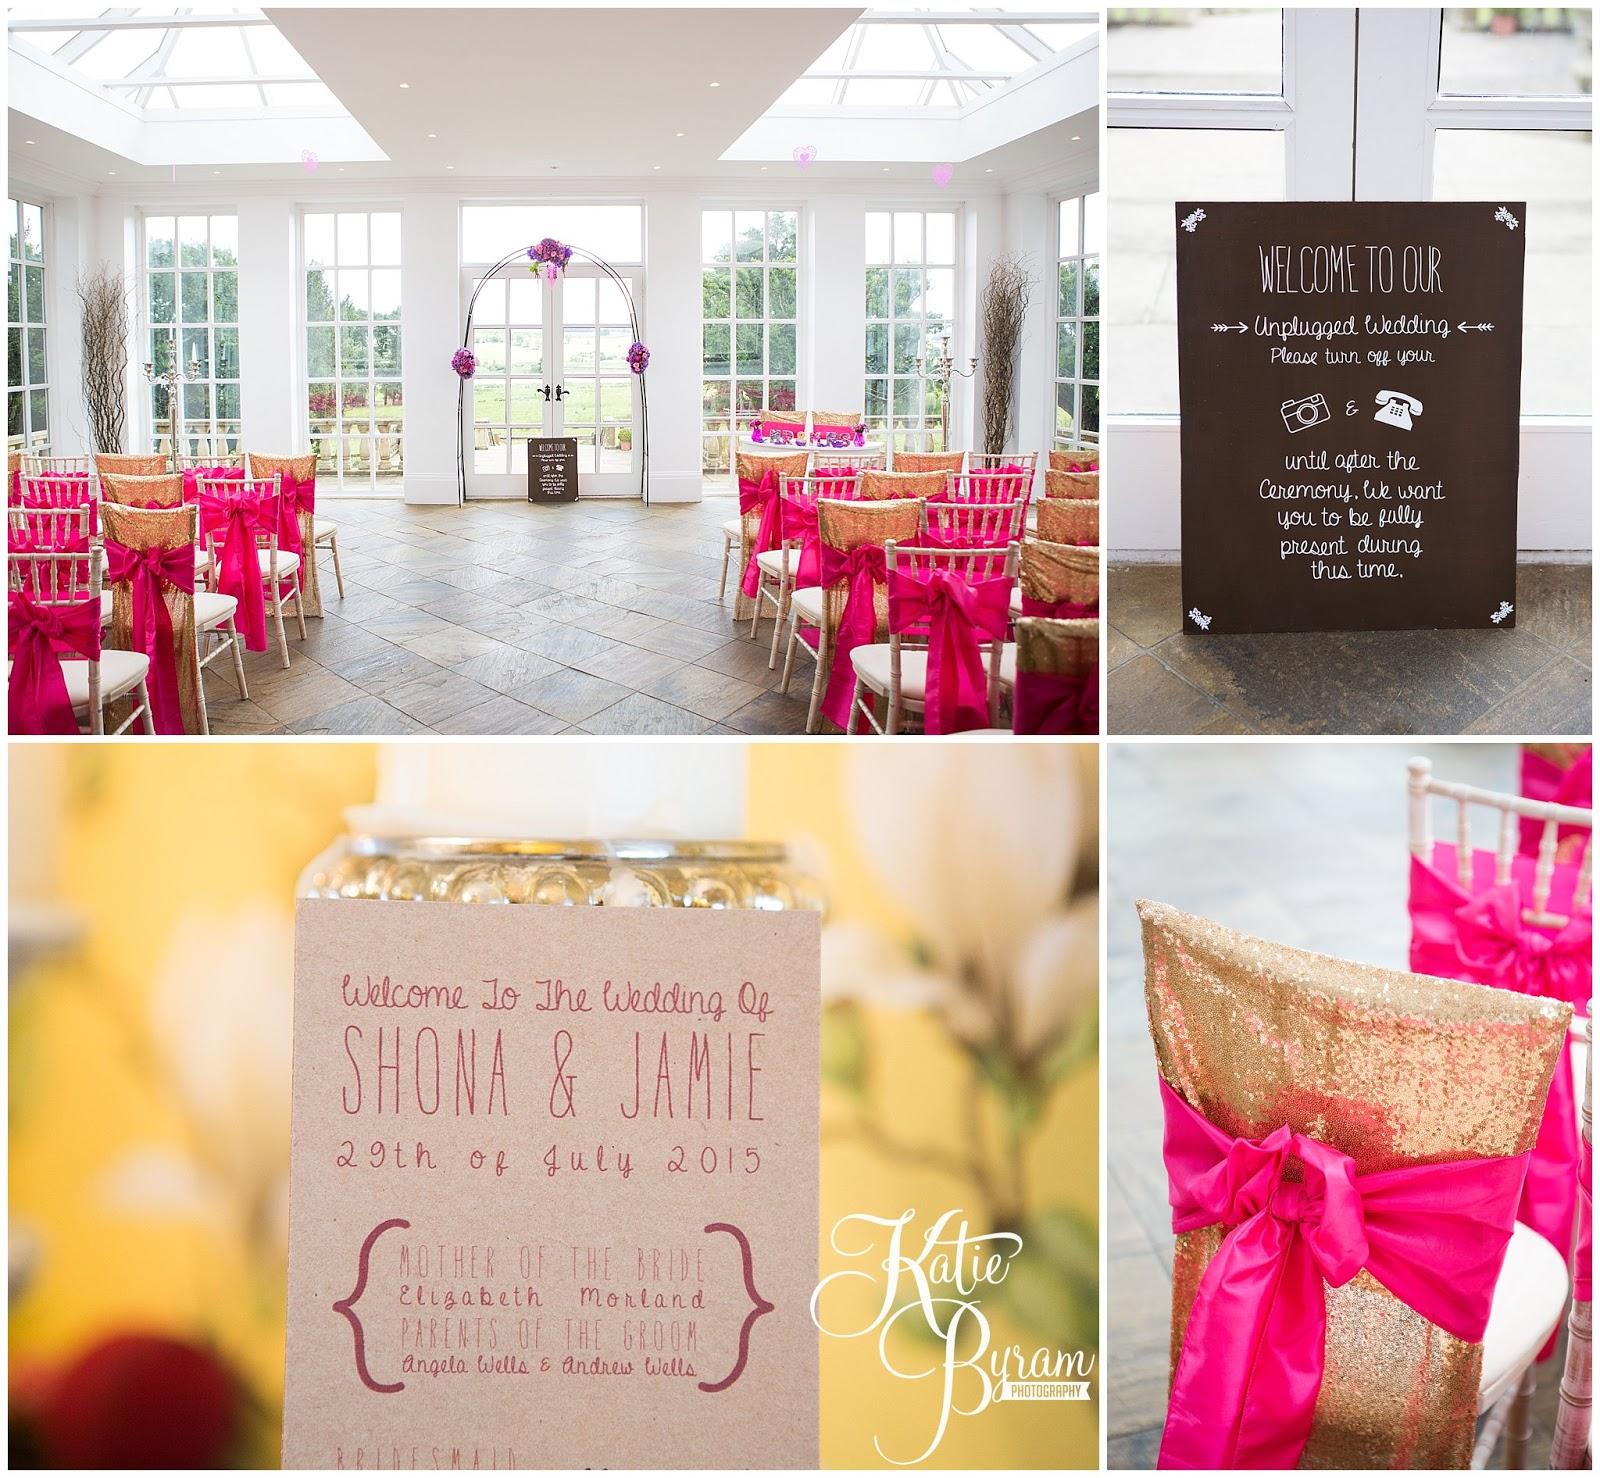 Colourful Wedding at Woodhill Hall Shona & Jamie Katie Byram